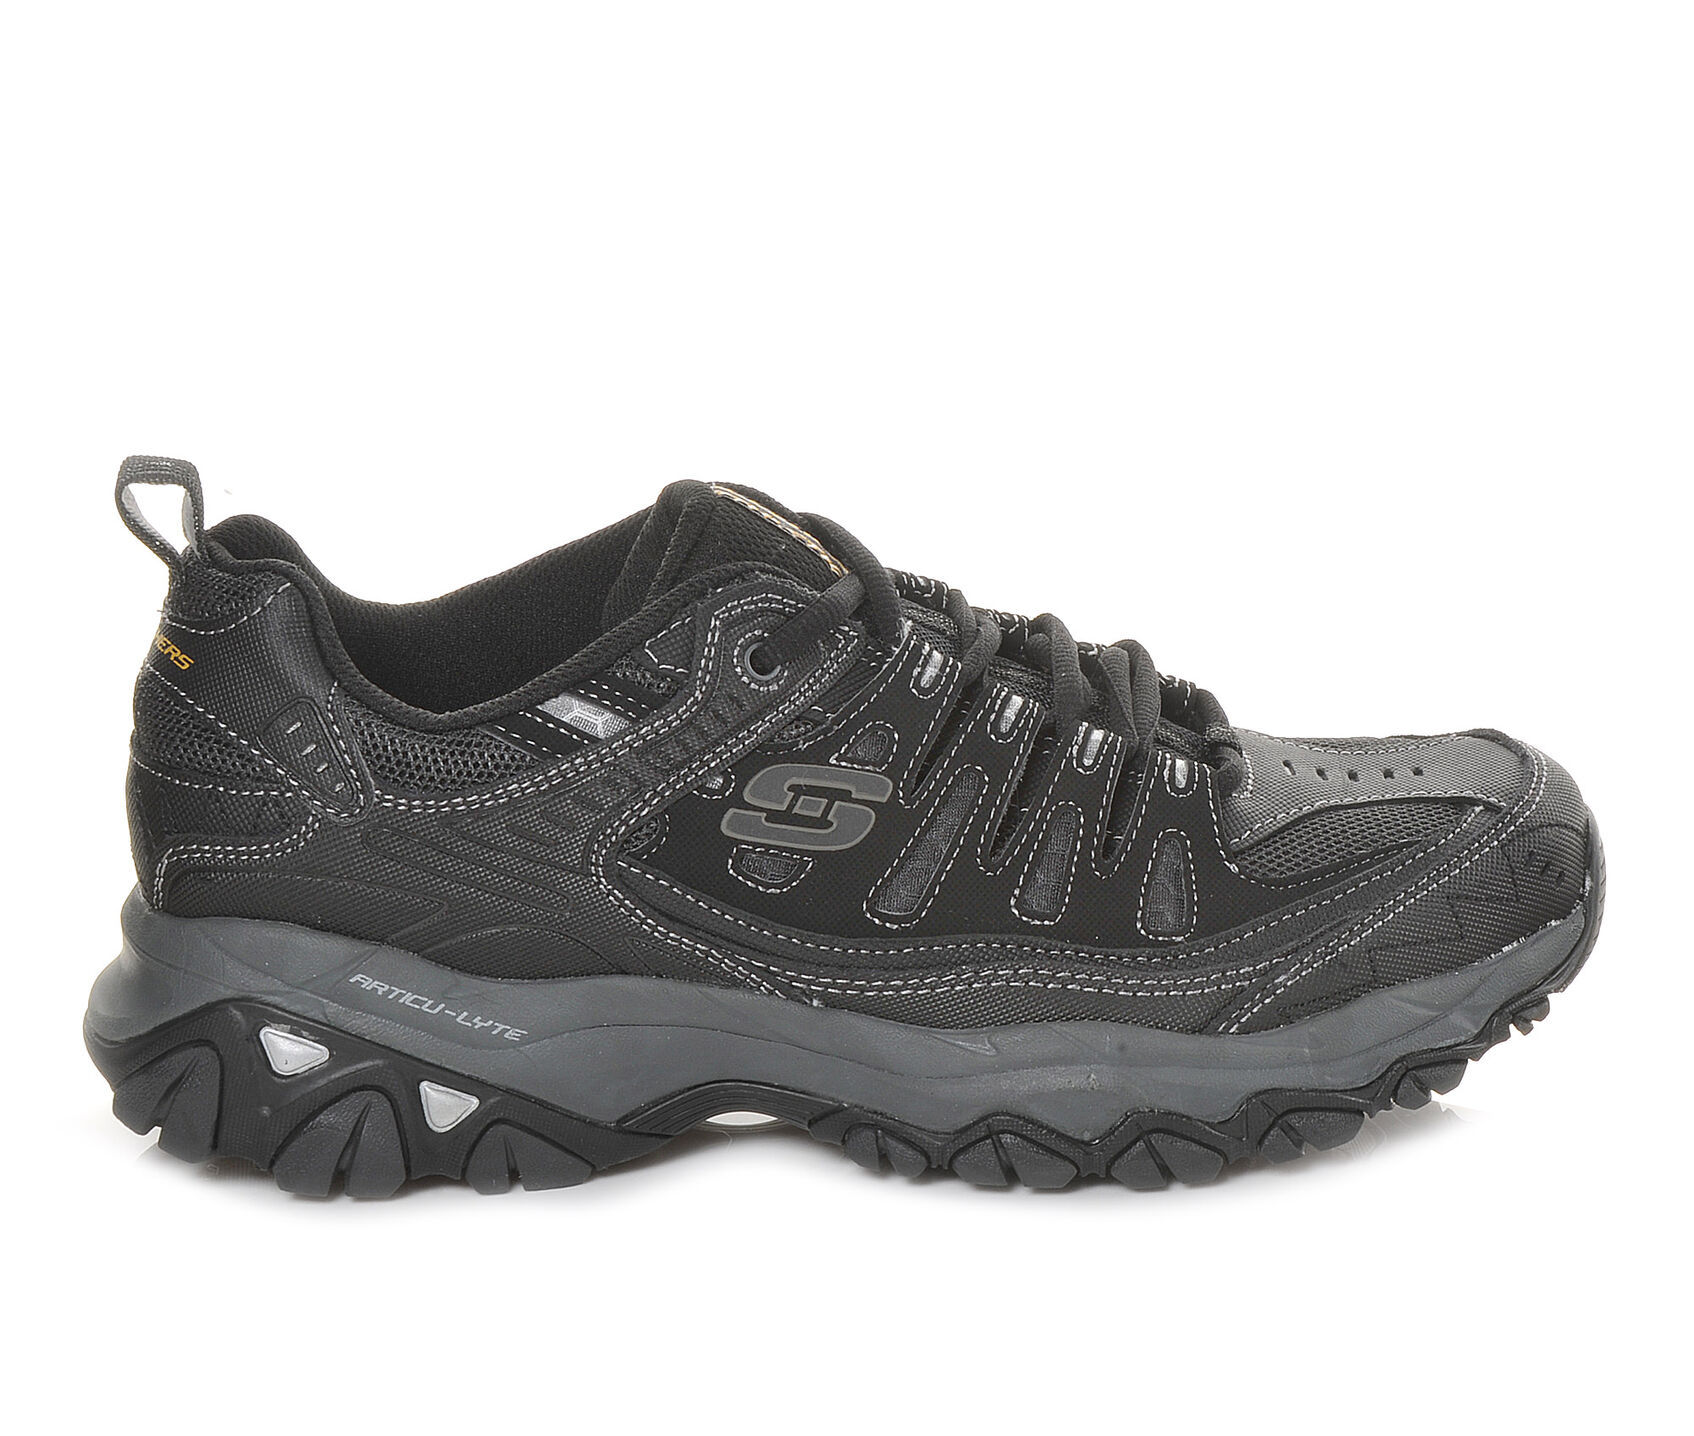 Skechers Tennis Shoes Reviews